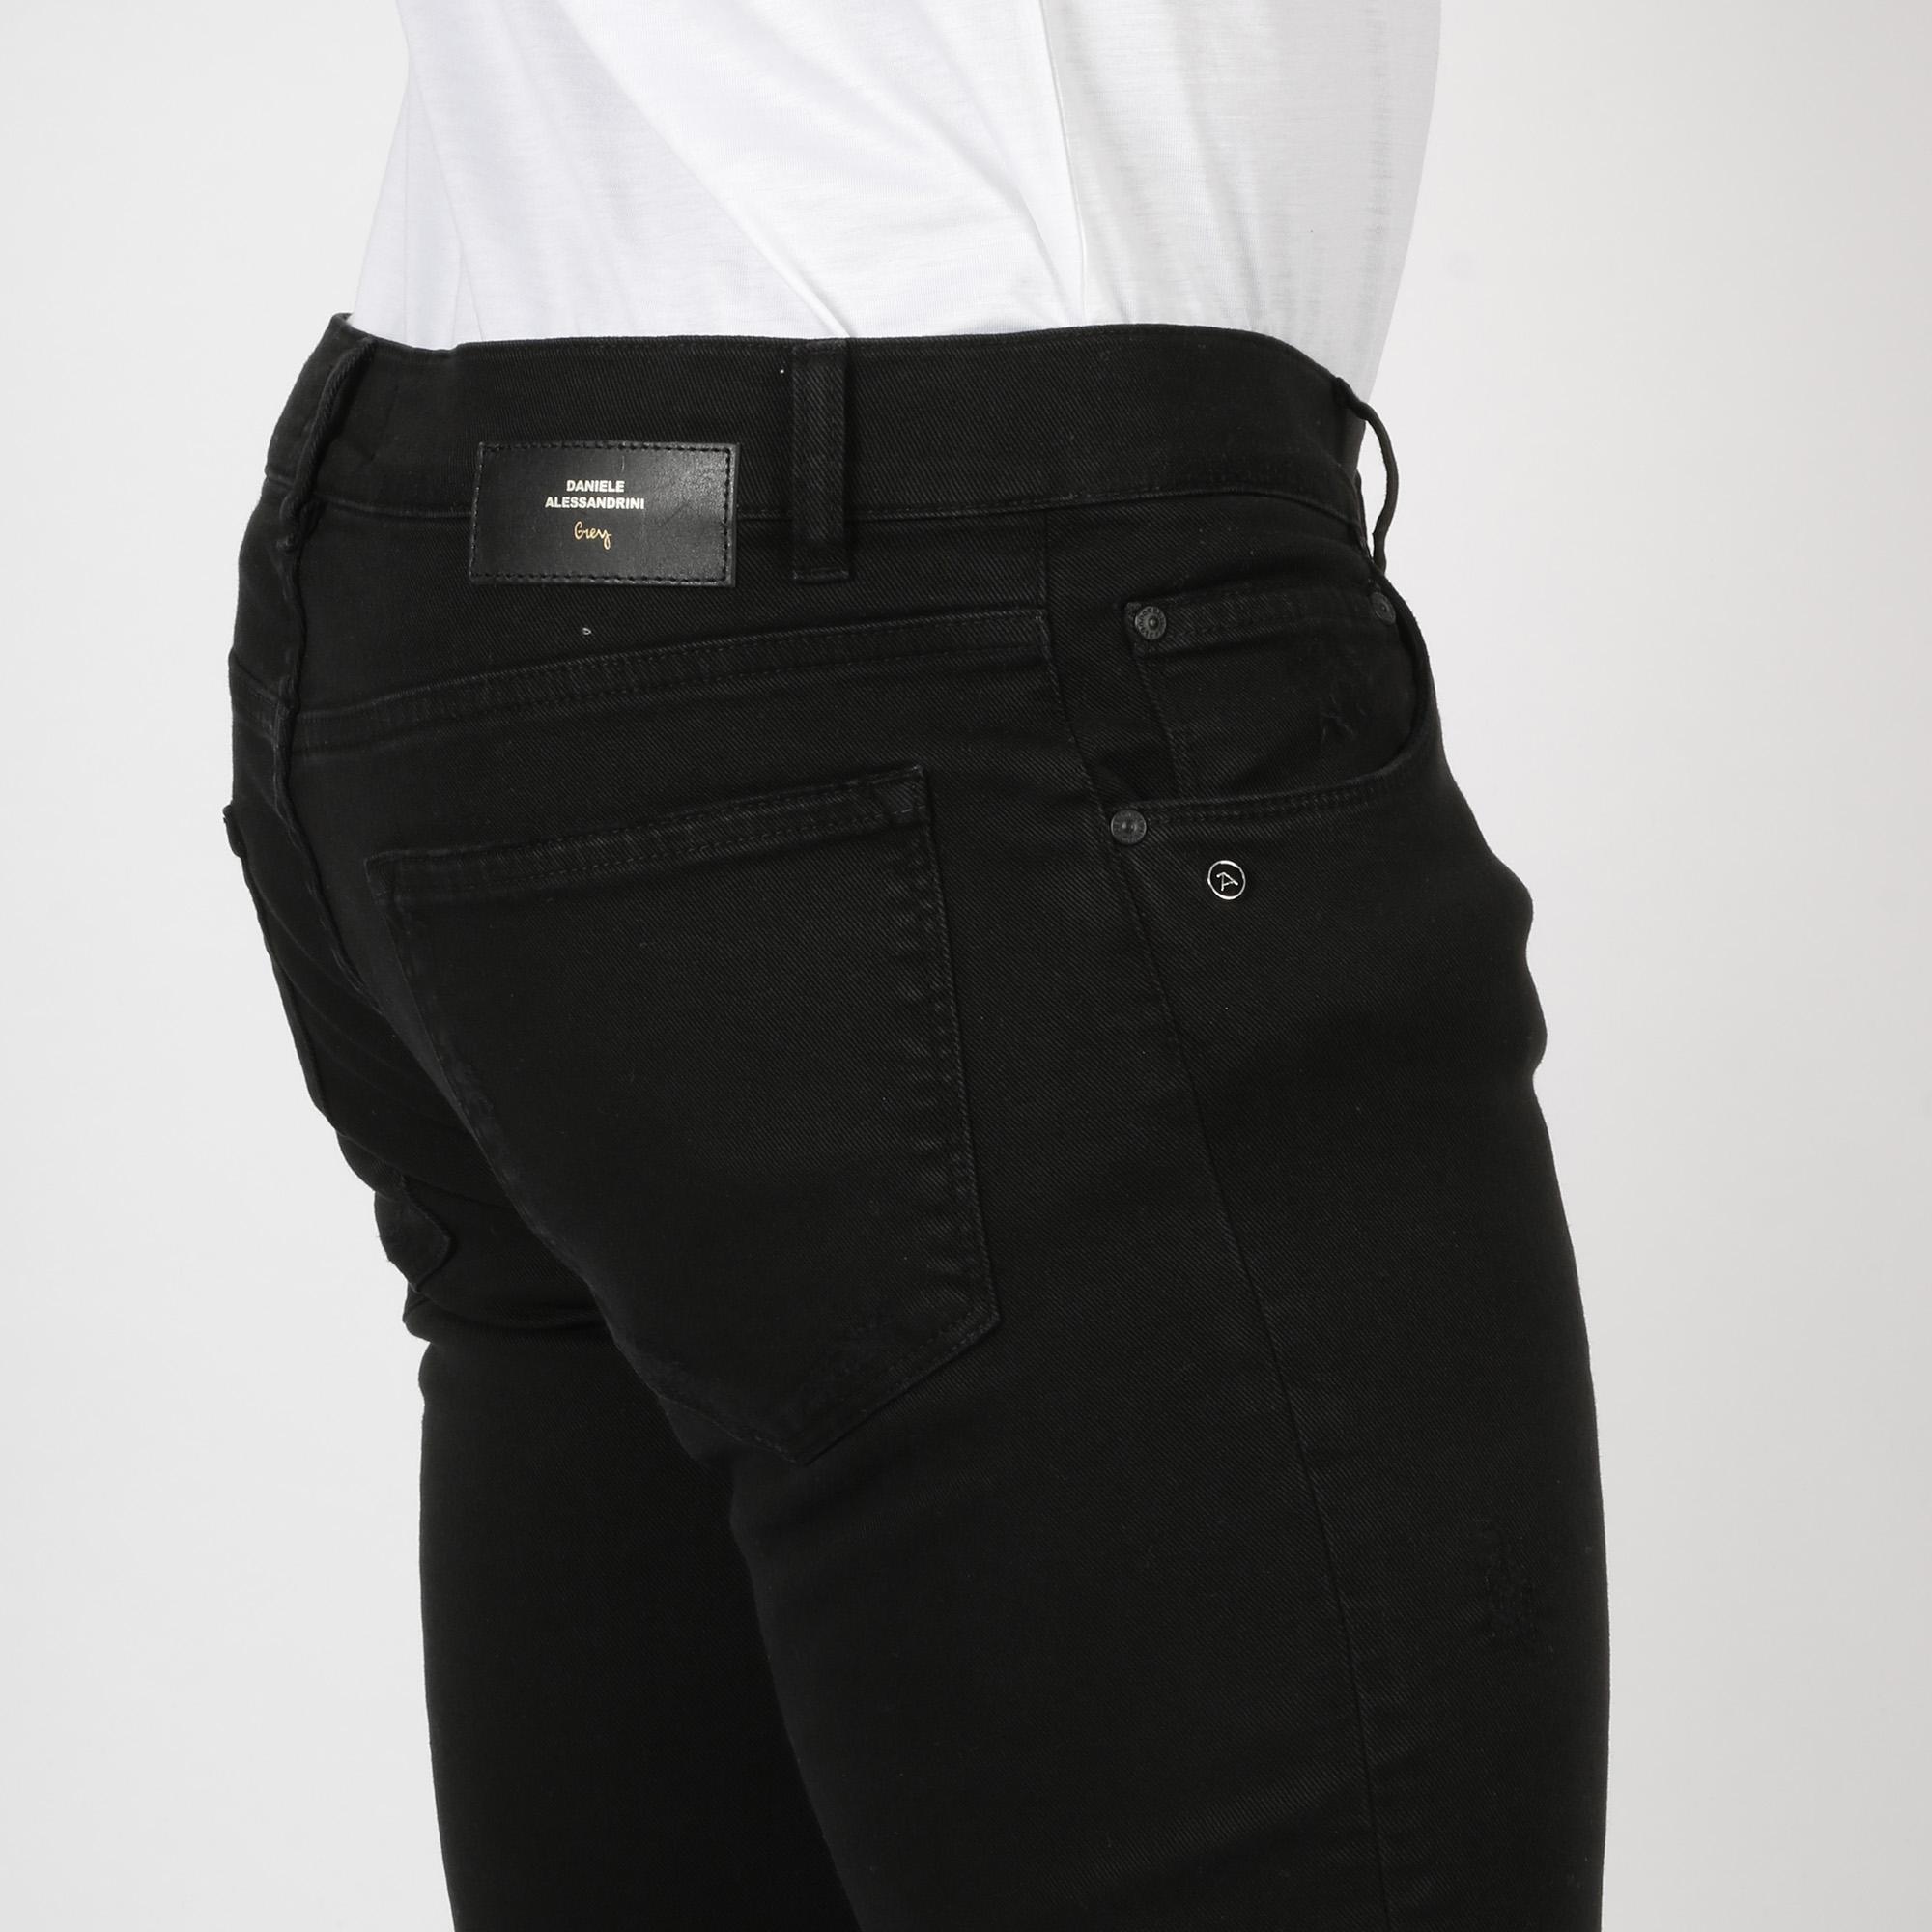 Pantalone 5 tasche grey - Nero